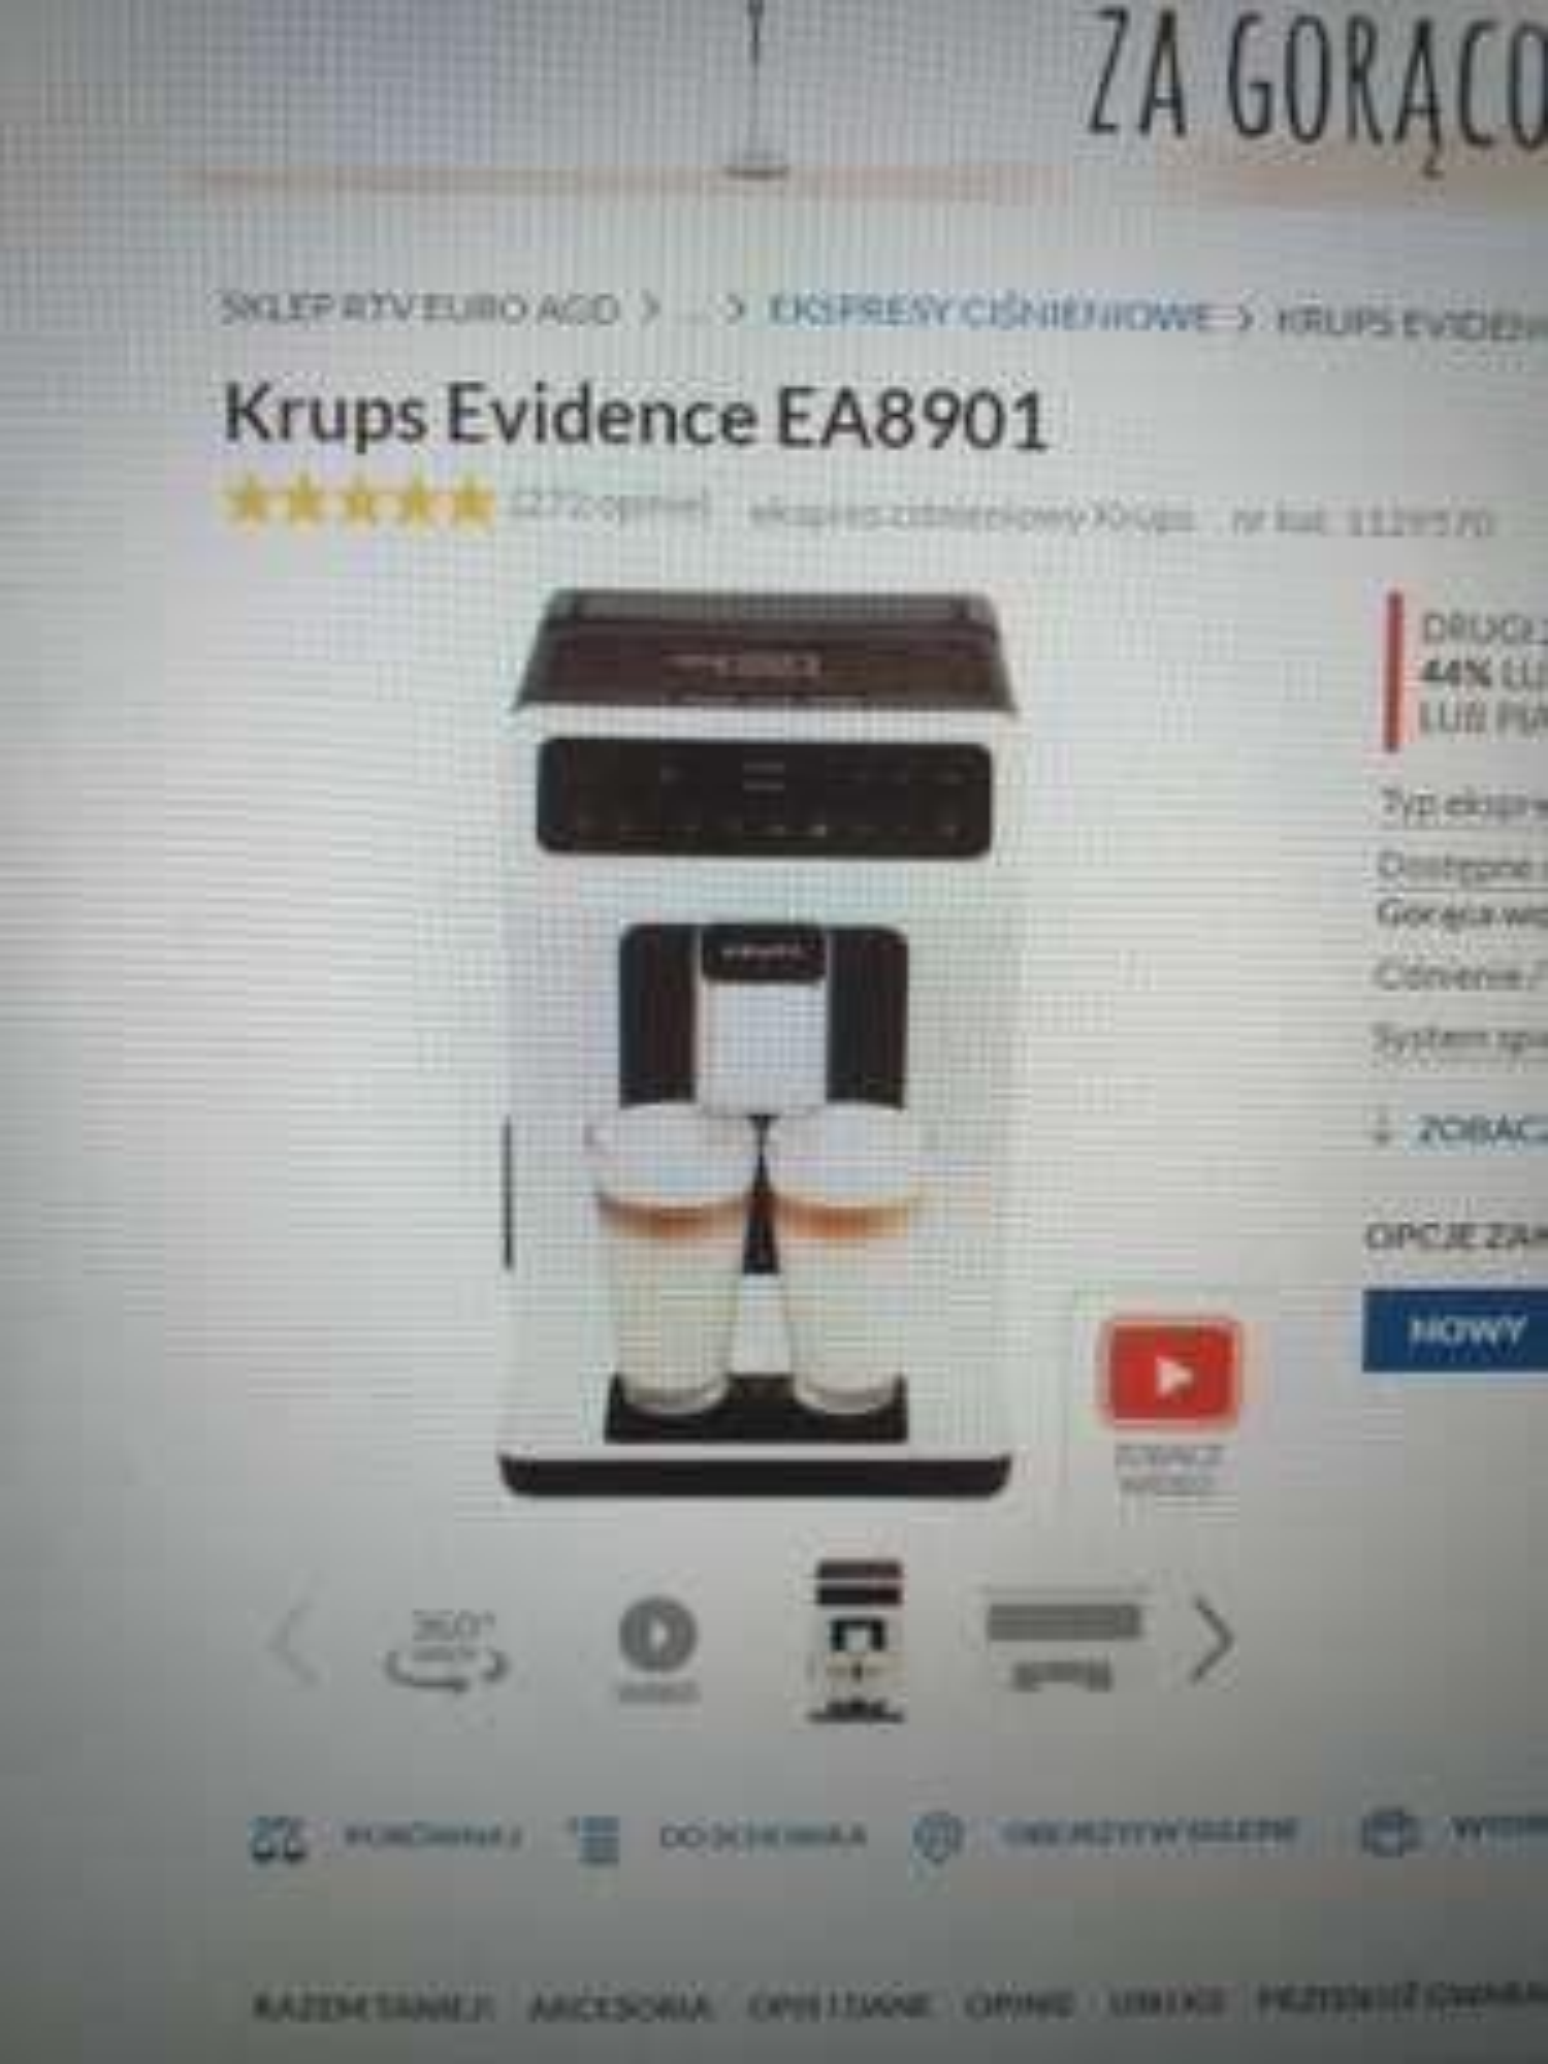 Promocją na ekspres Krups Evidence EA8901